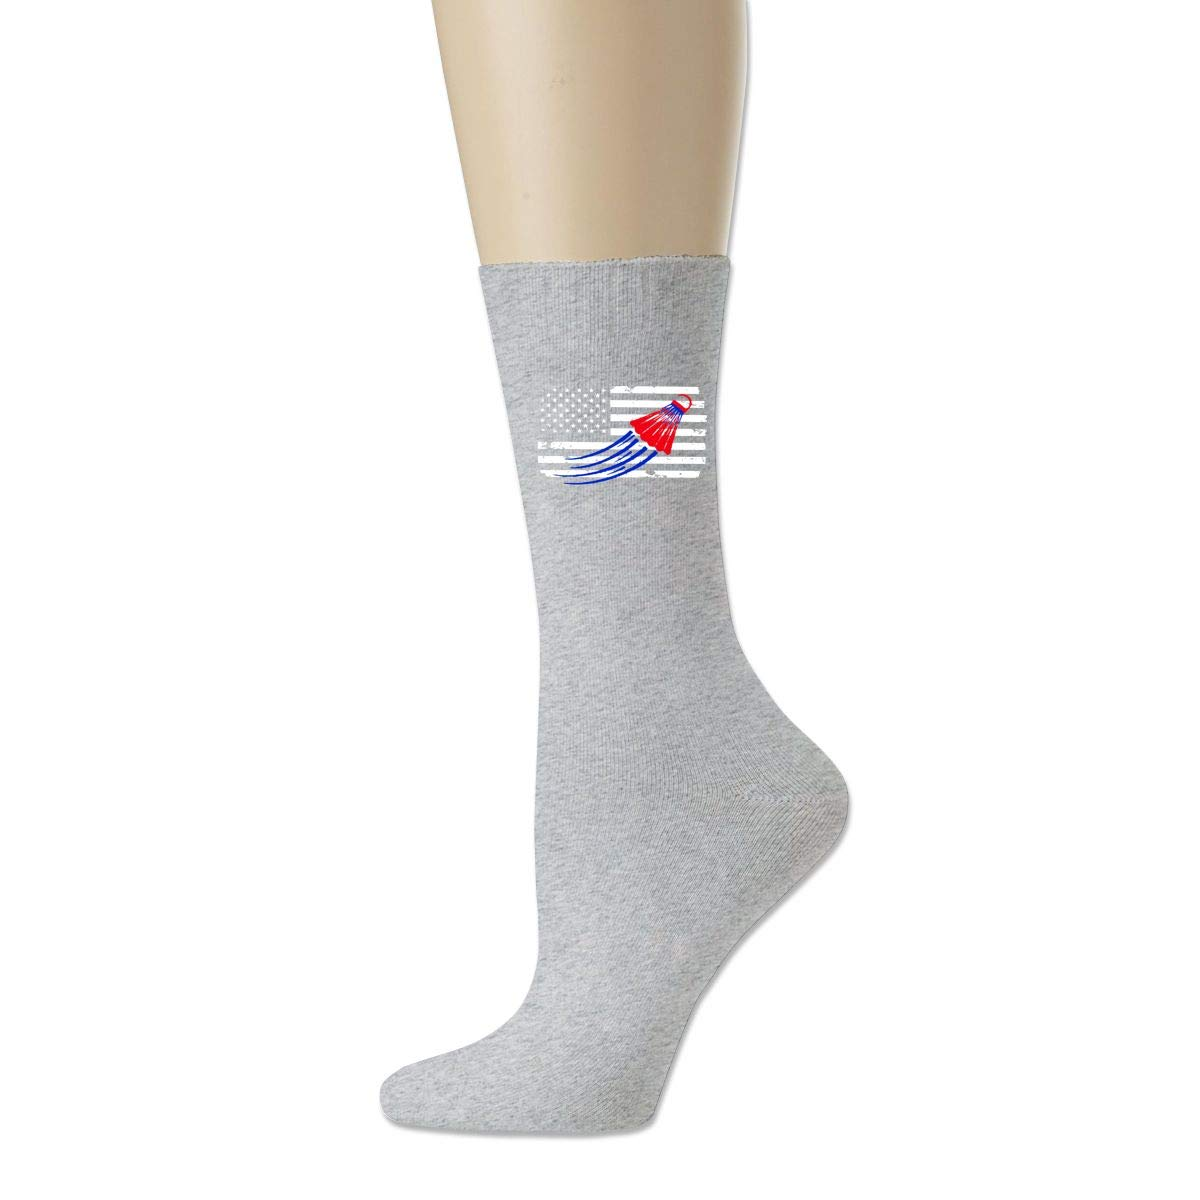 Cotton Crew Bobbysox Ski Socks Unisex Soccer Socks Badminton American Flag